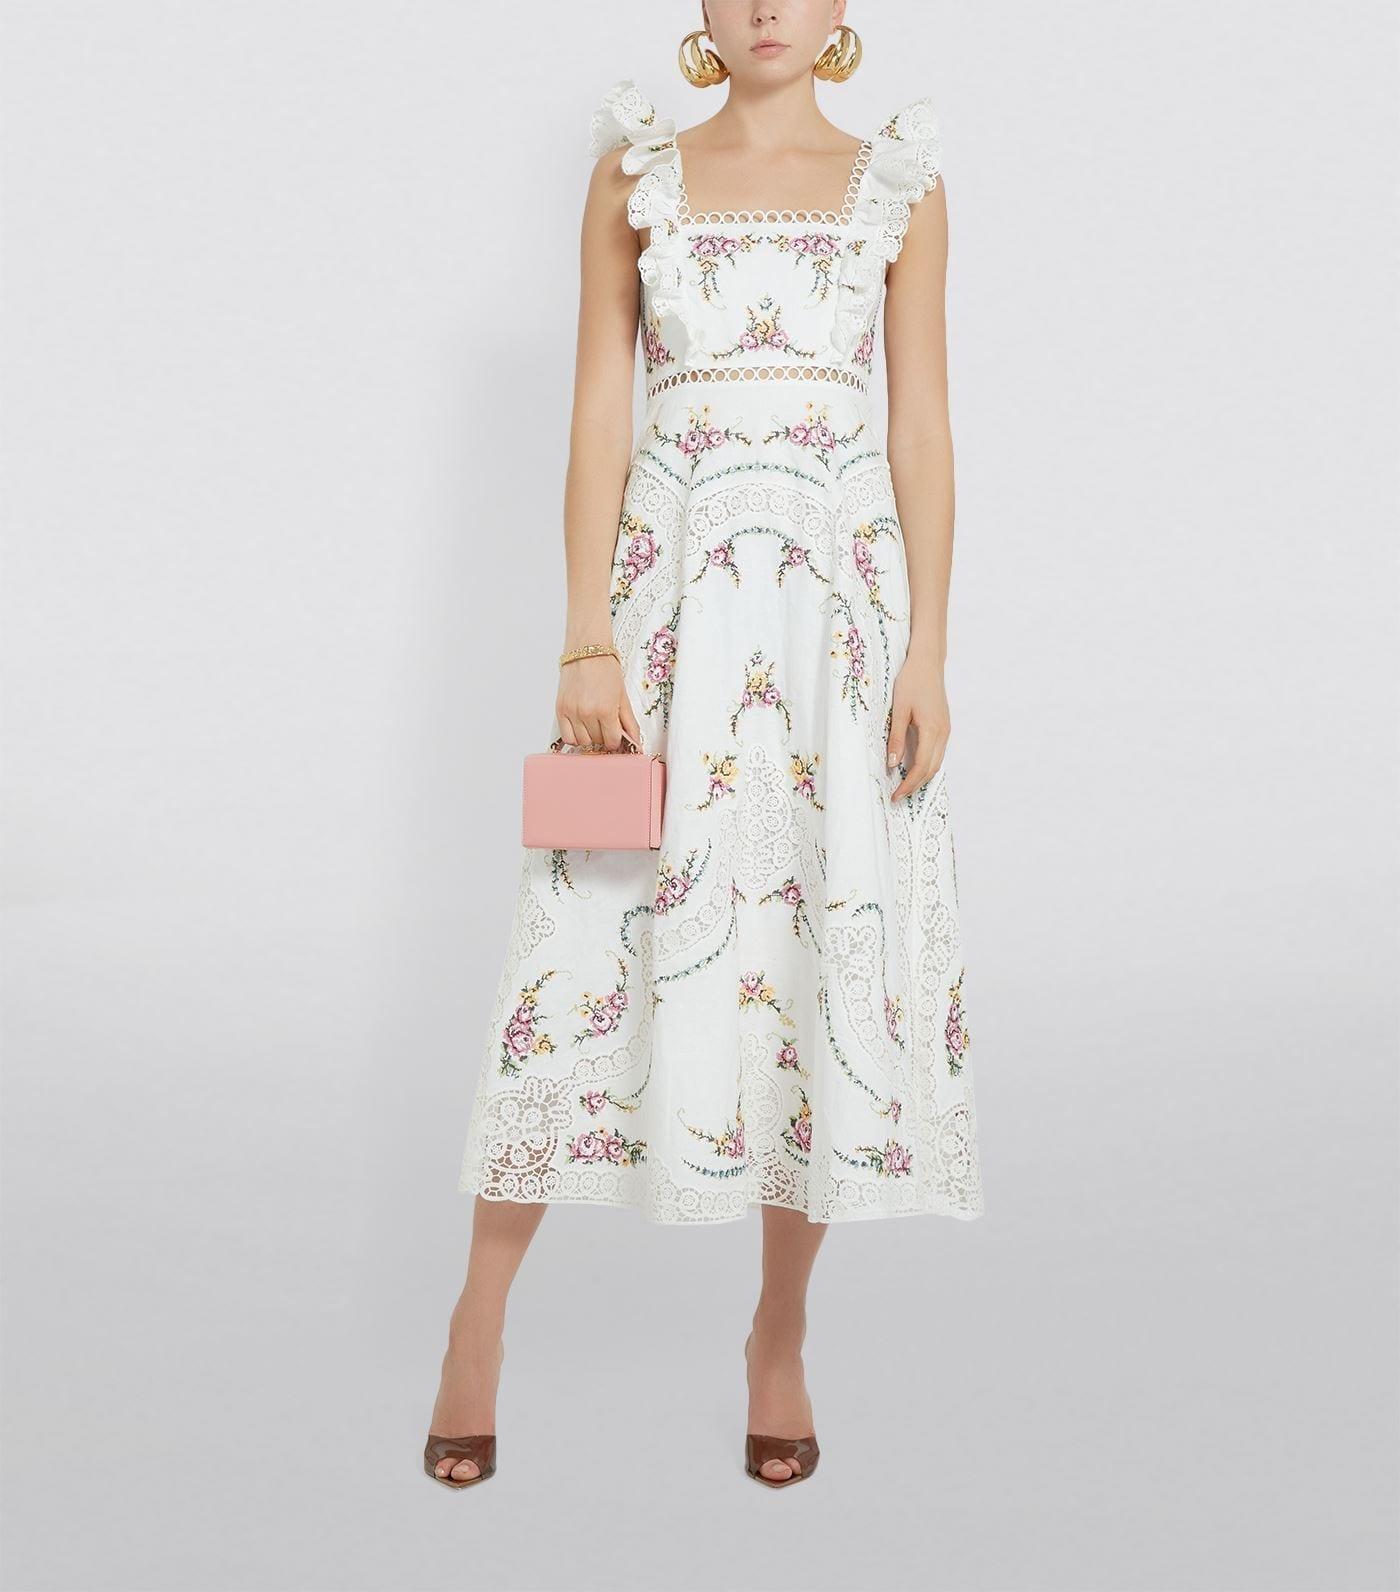 ZIMMERMANN Cross-Stitch Allia Dress